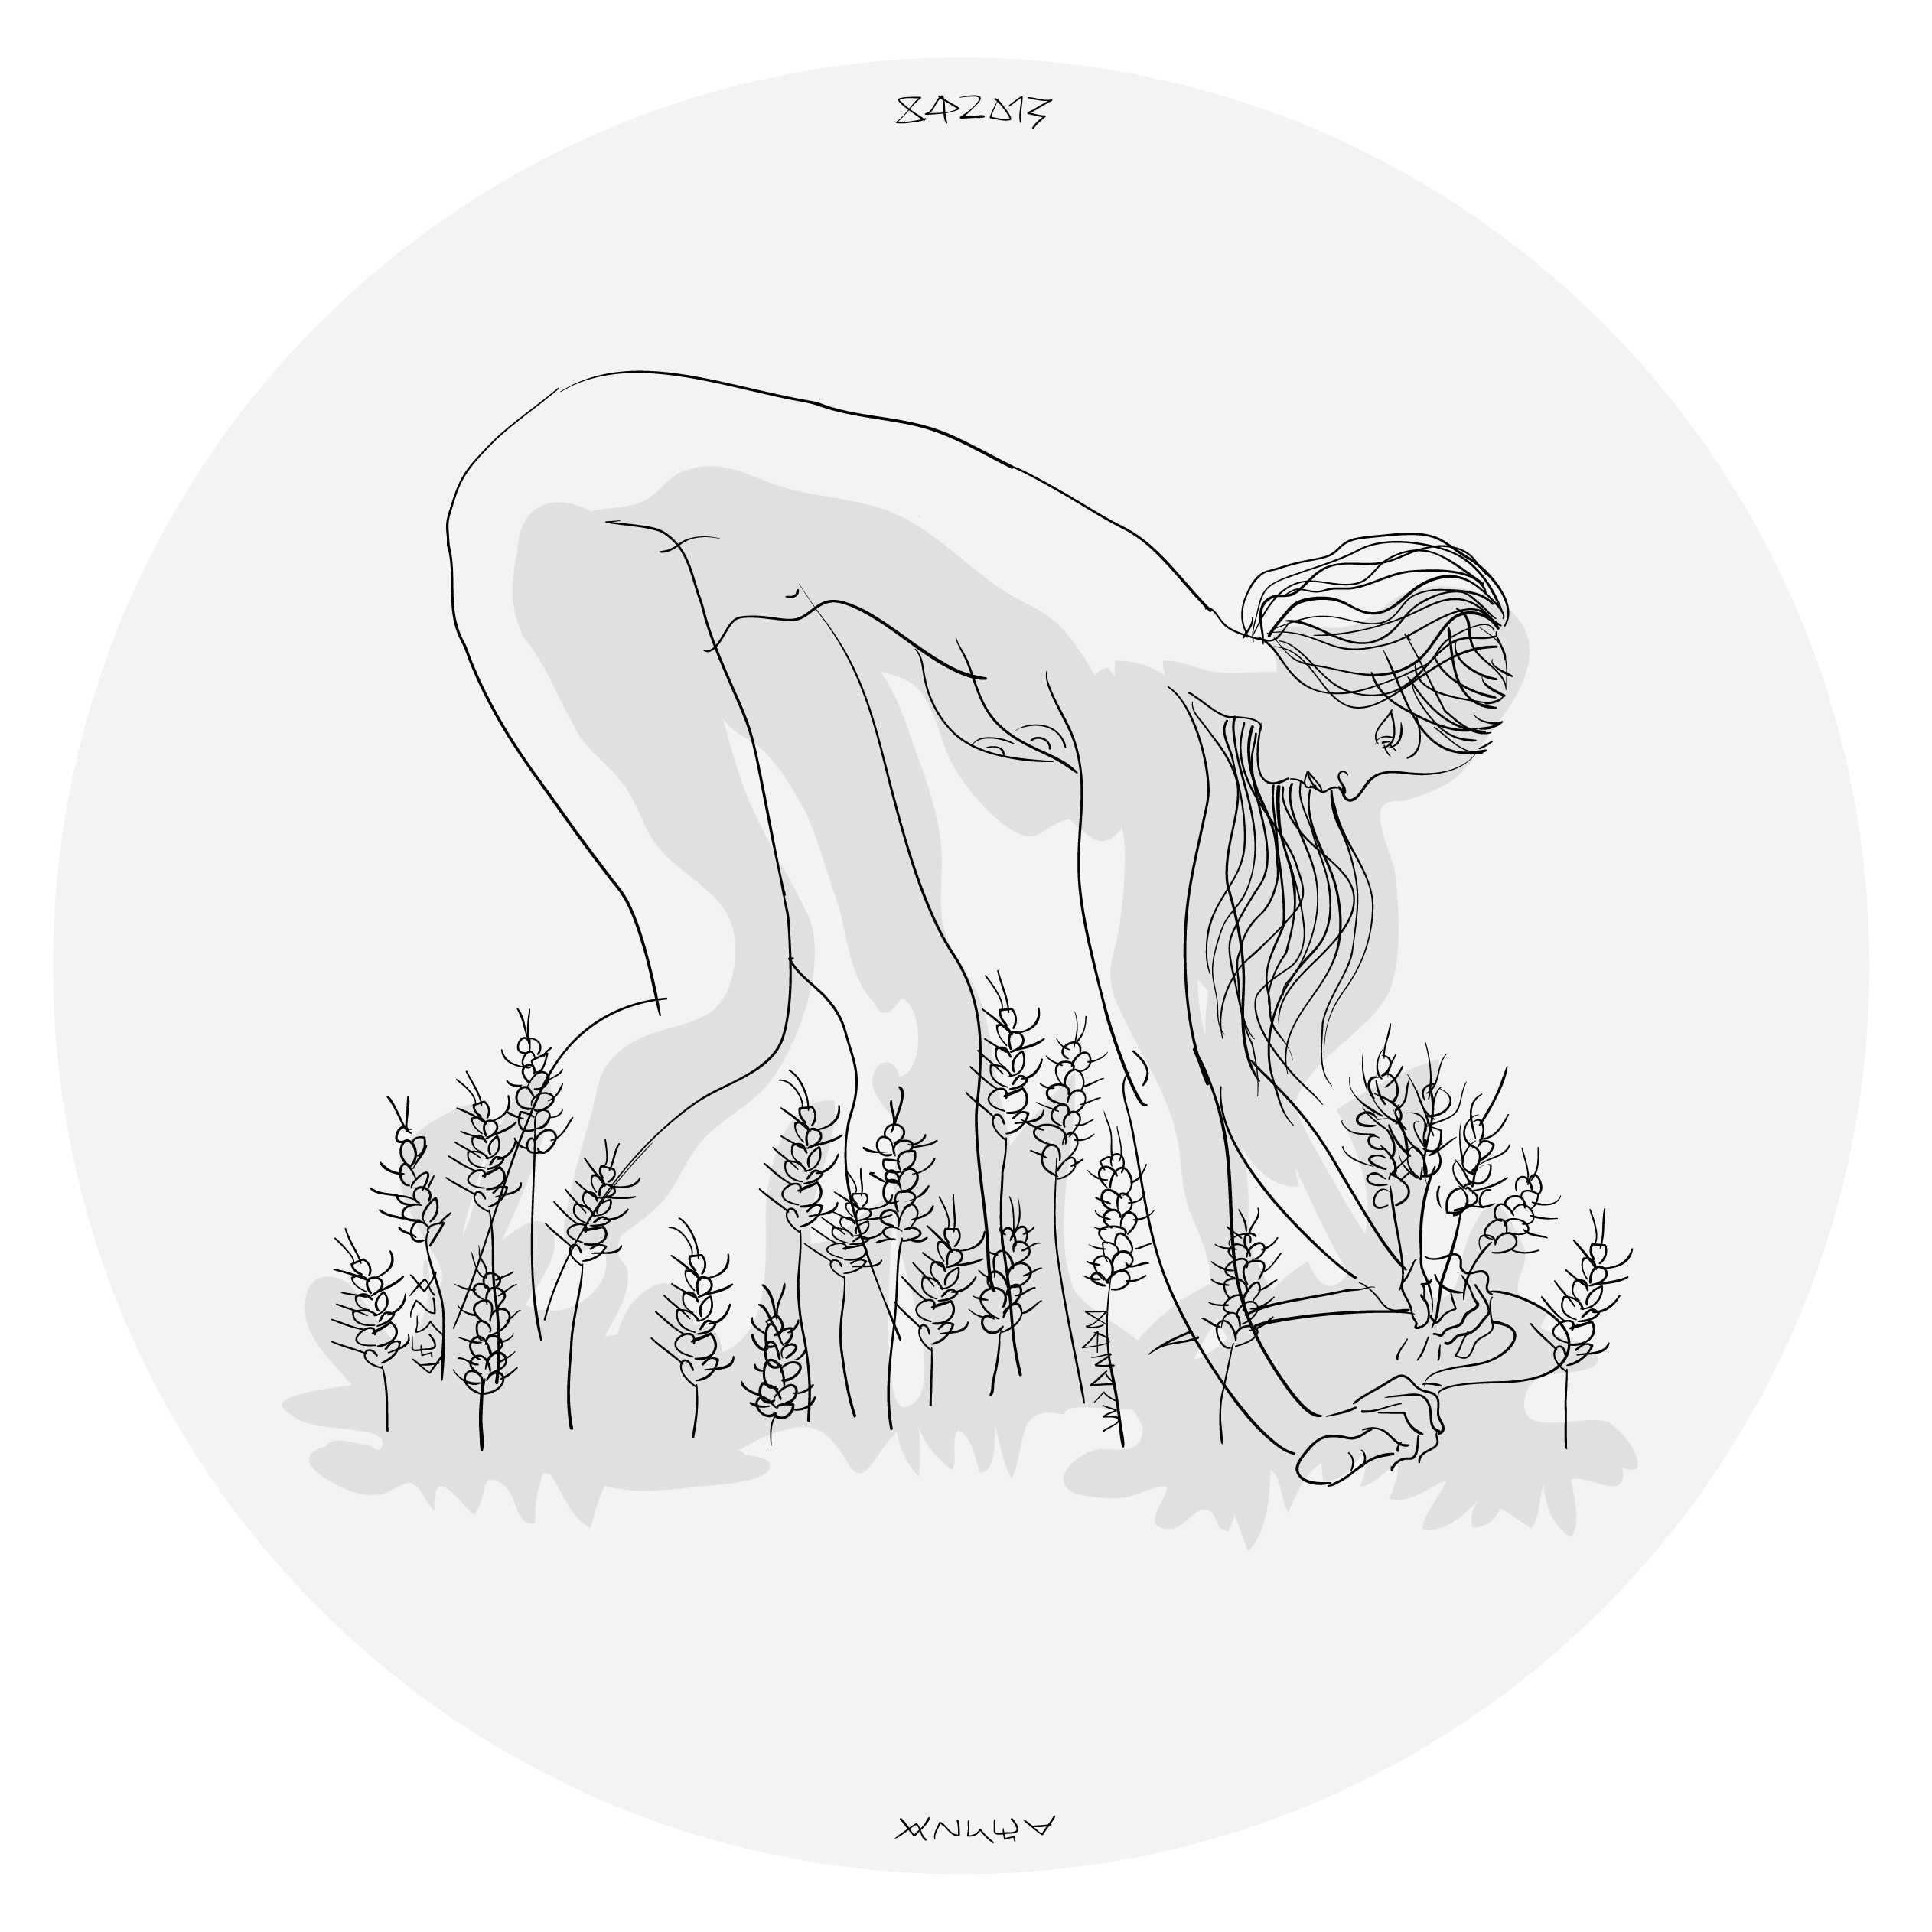 [2wx] Жница A047a[tenn]